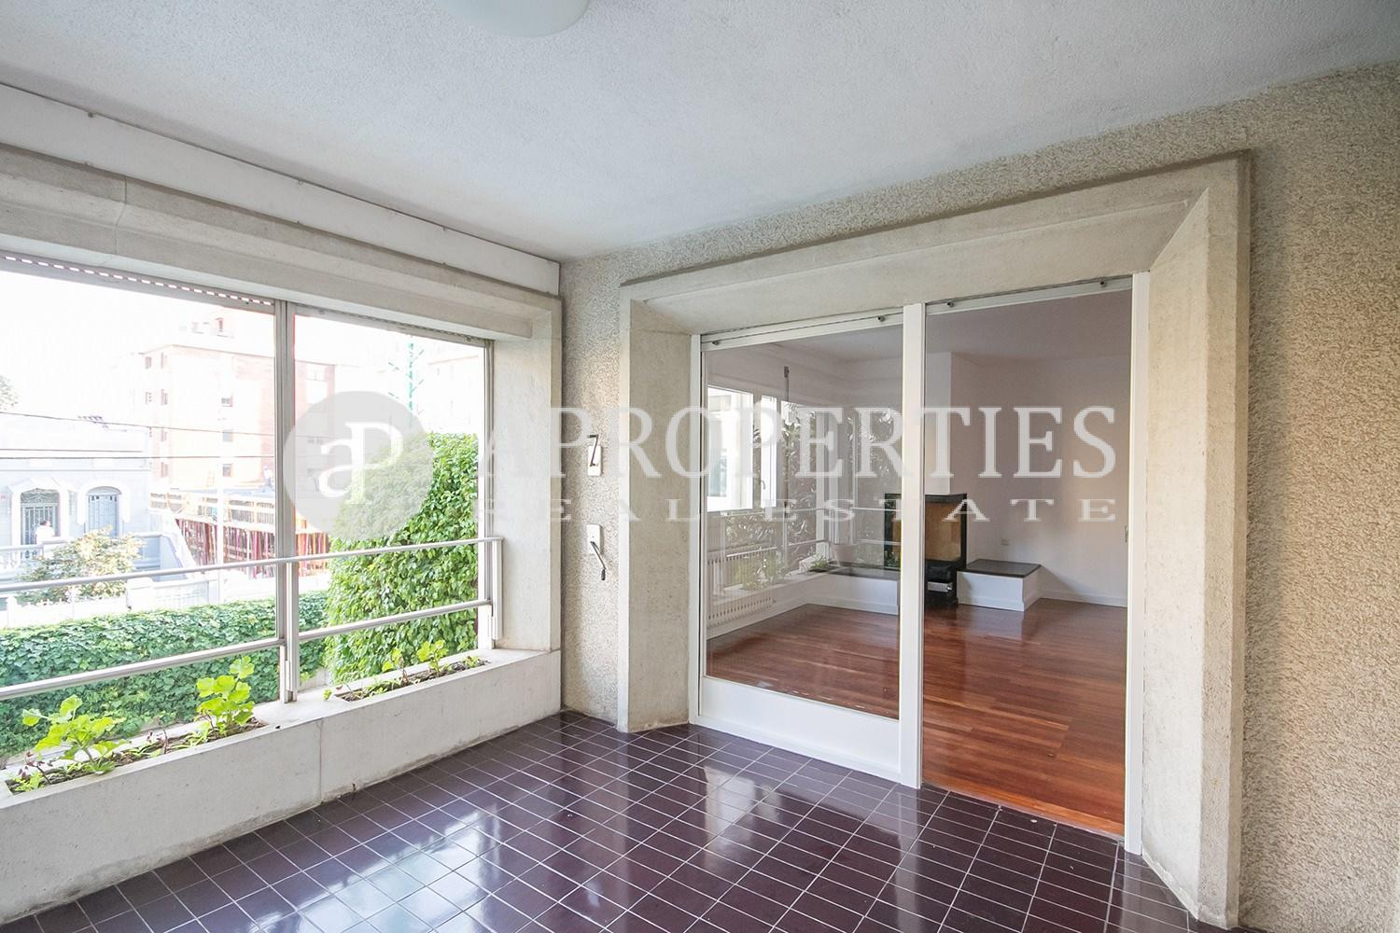 Maravilloso piso en alquiler con piscina en tres torres - Pisos con piscina en barcelona alquiler ...